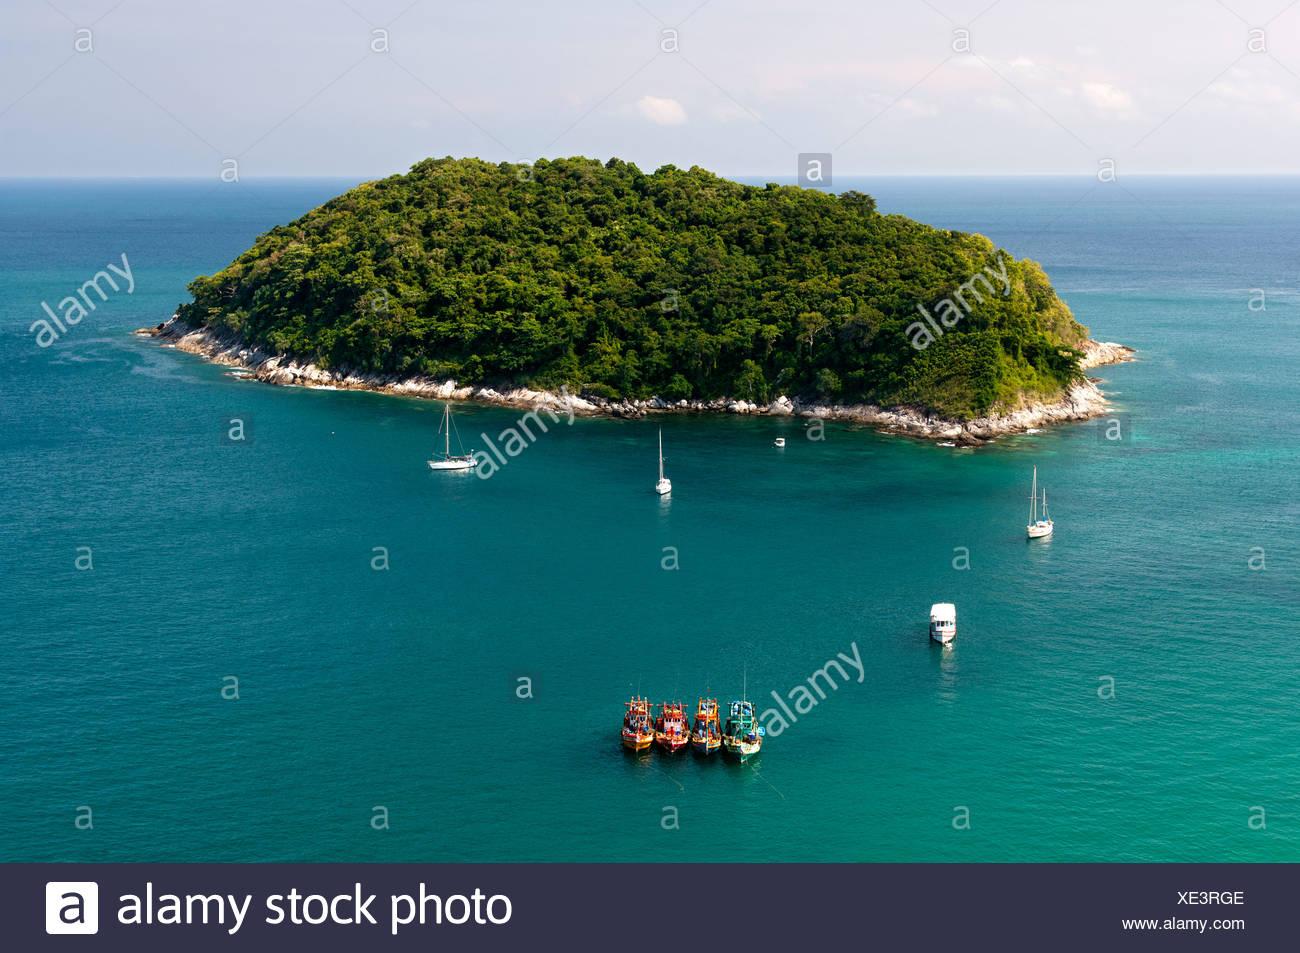 Ko Man or Mun Island off the southern coast of the island of Phuket, Thailand, Asia - Stock Image